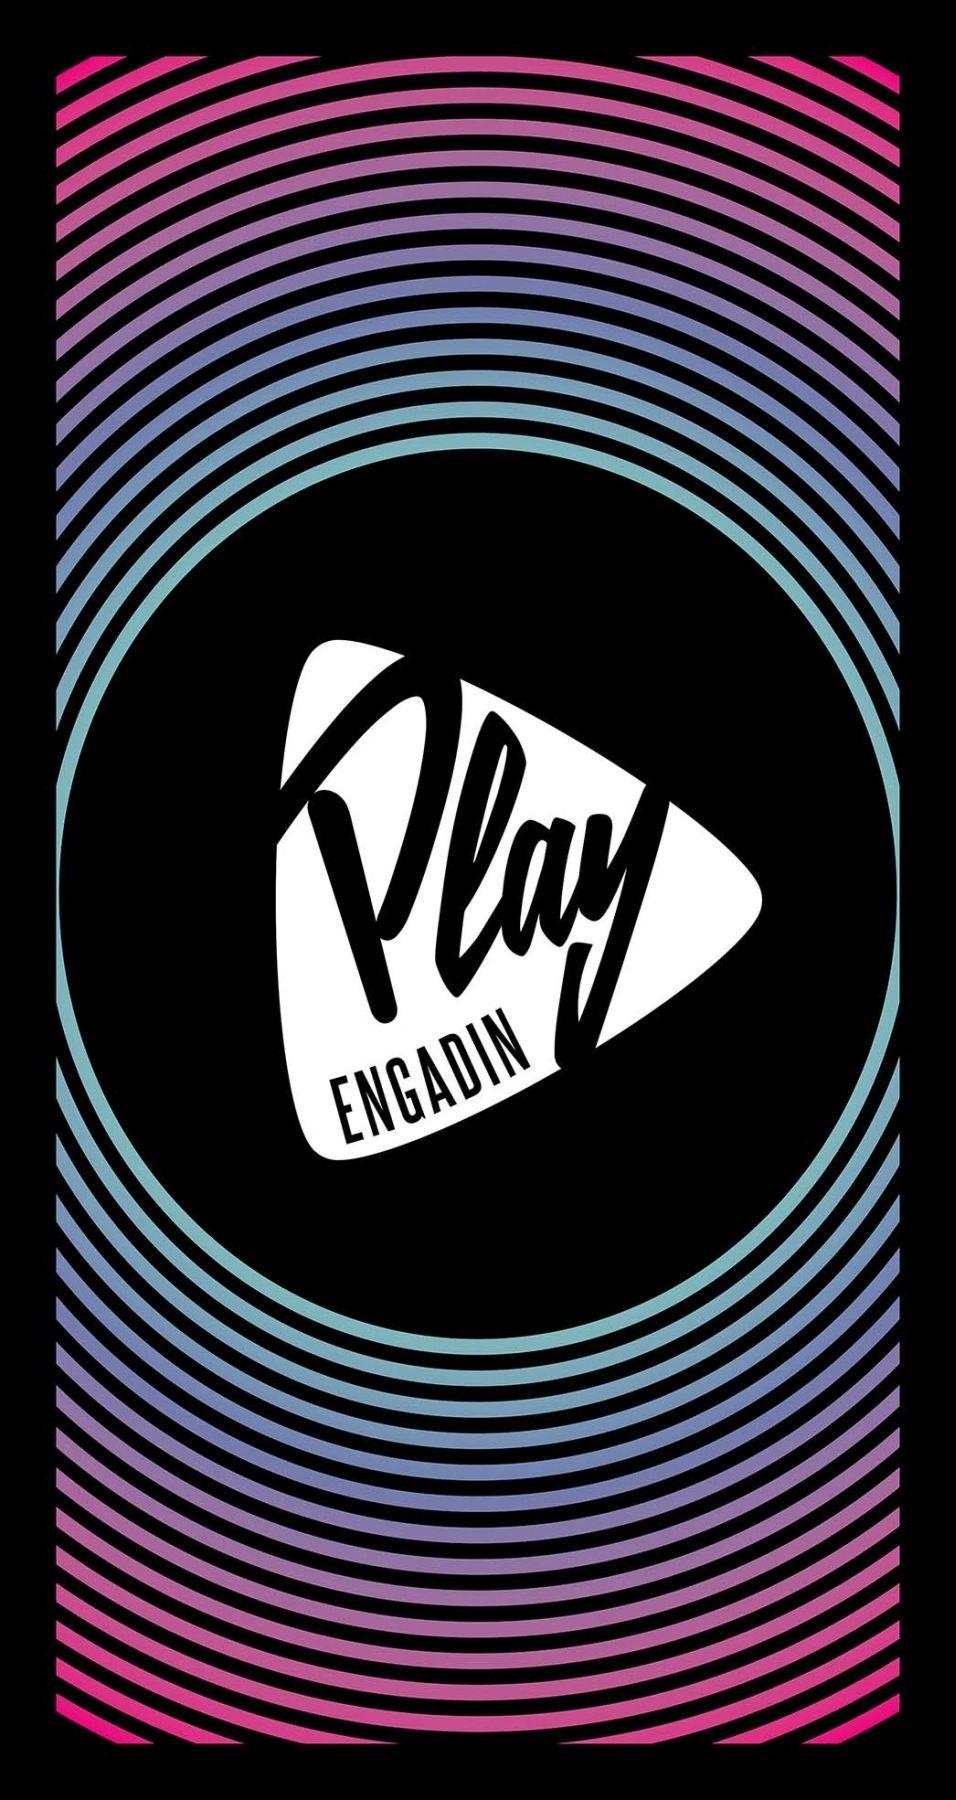 Play Engadin -Telo in microfibra DrySecc leggero e performante.